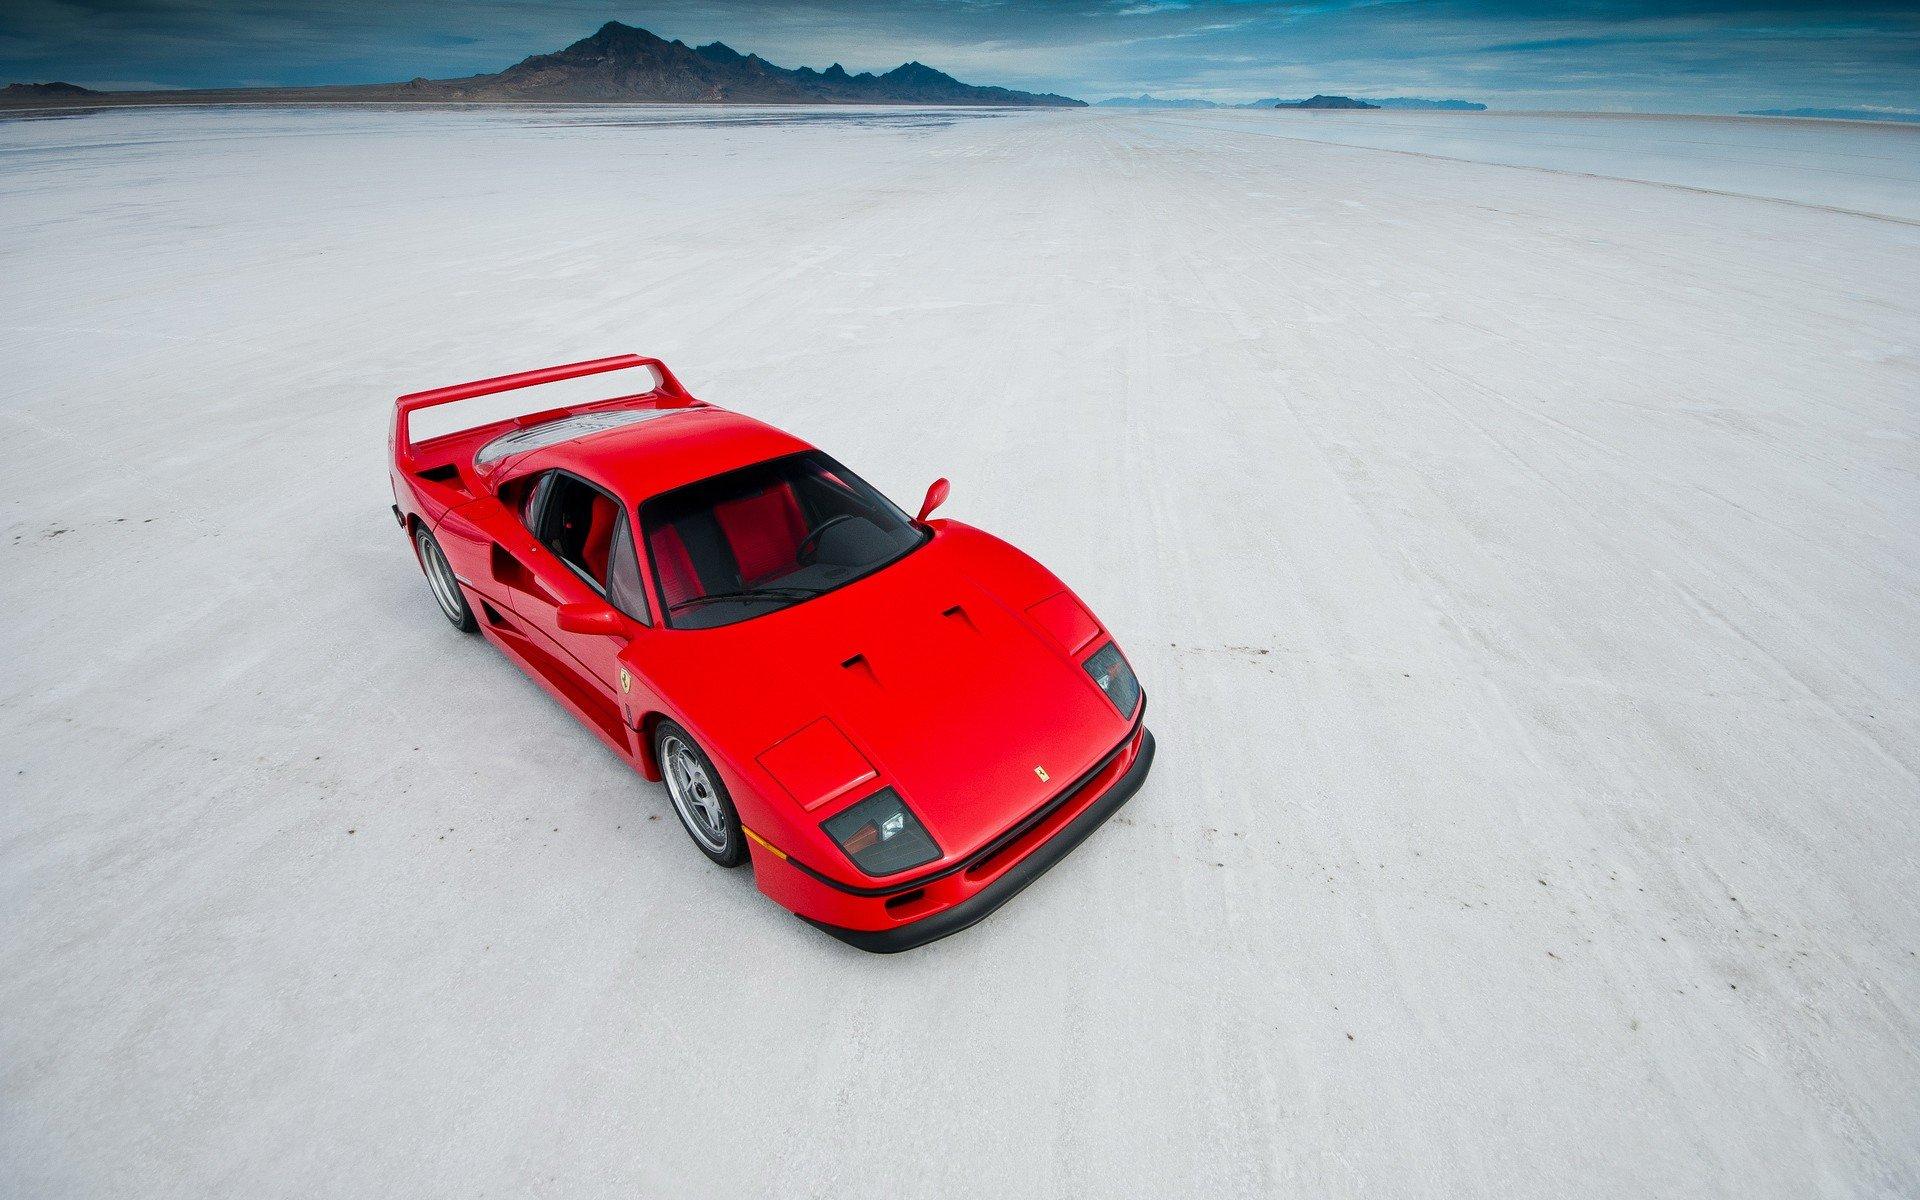 Ferrari F40 Wallpapers 1920x1200 Desktop Backgrounds